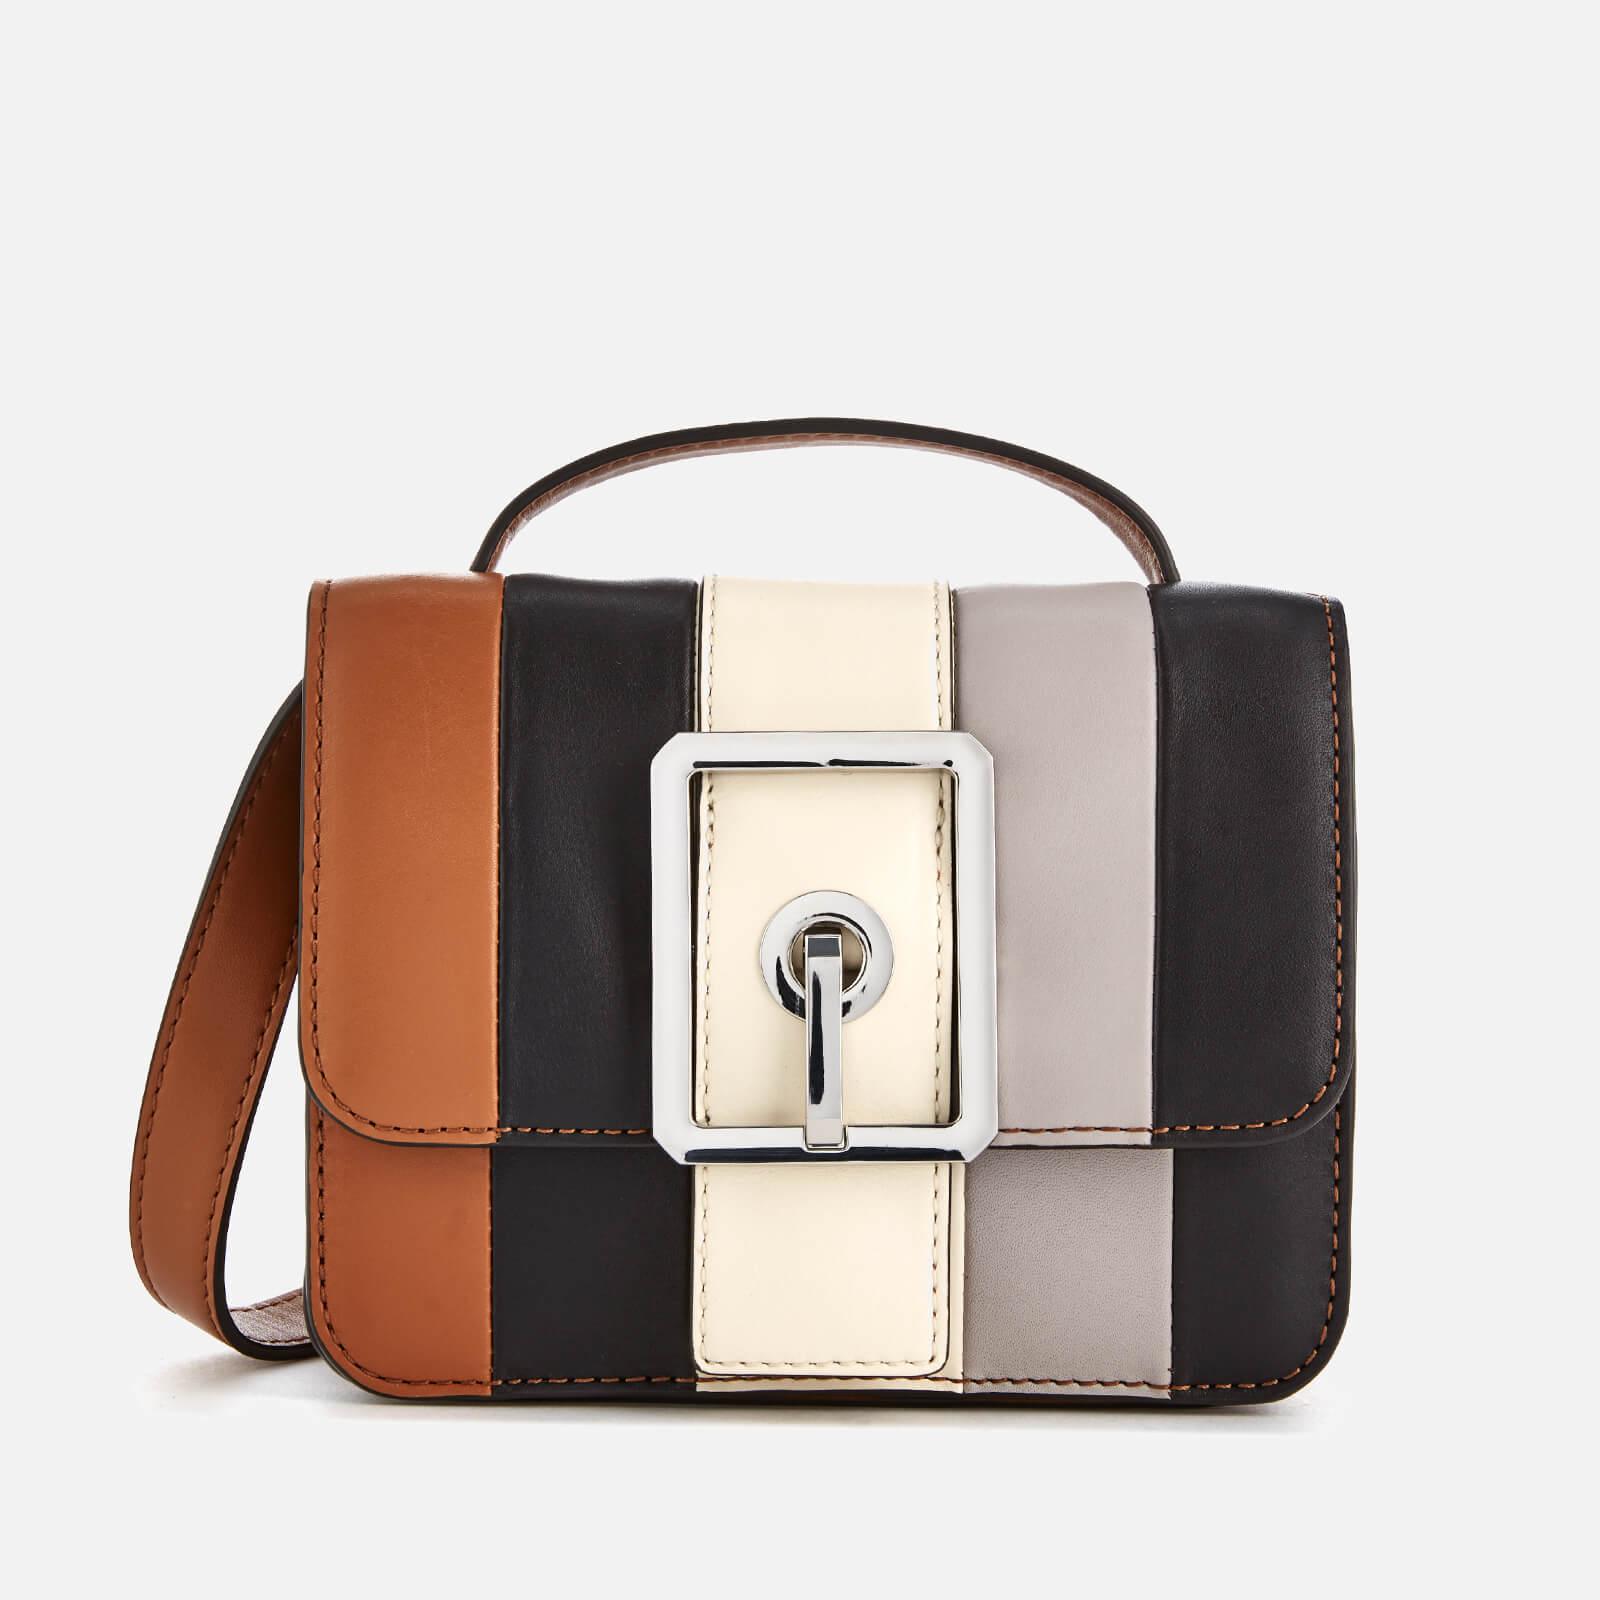 0434b081 Rebecca Minkoff Women's Hook Up Small Cross Body Bag - Almond Multi